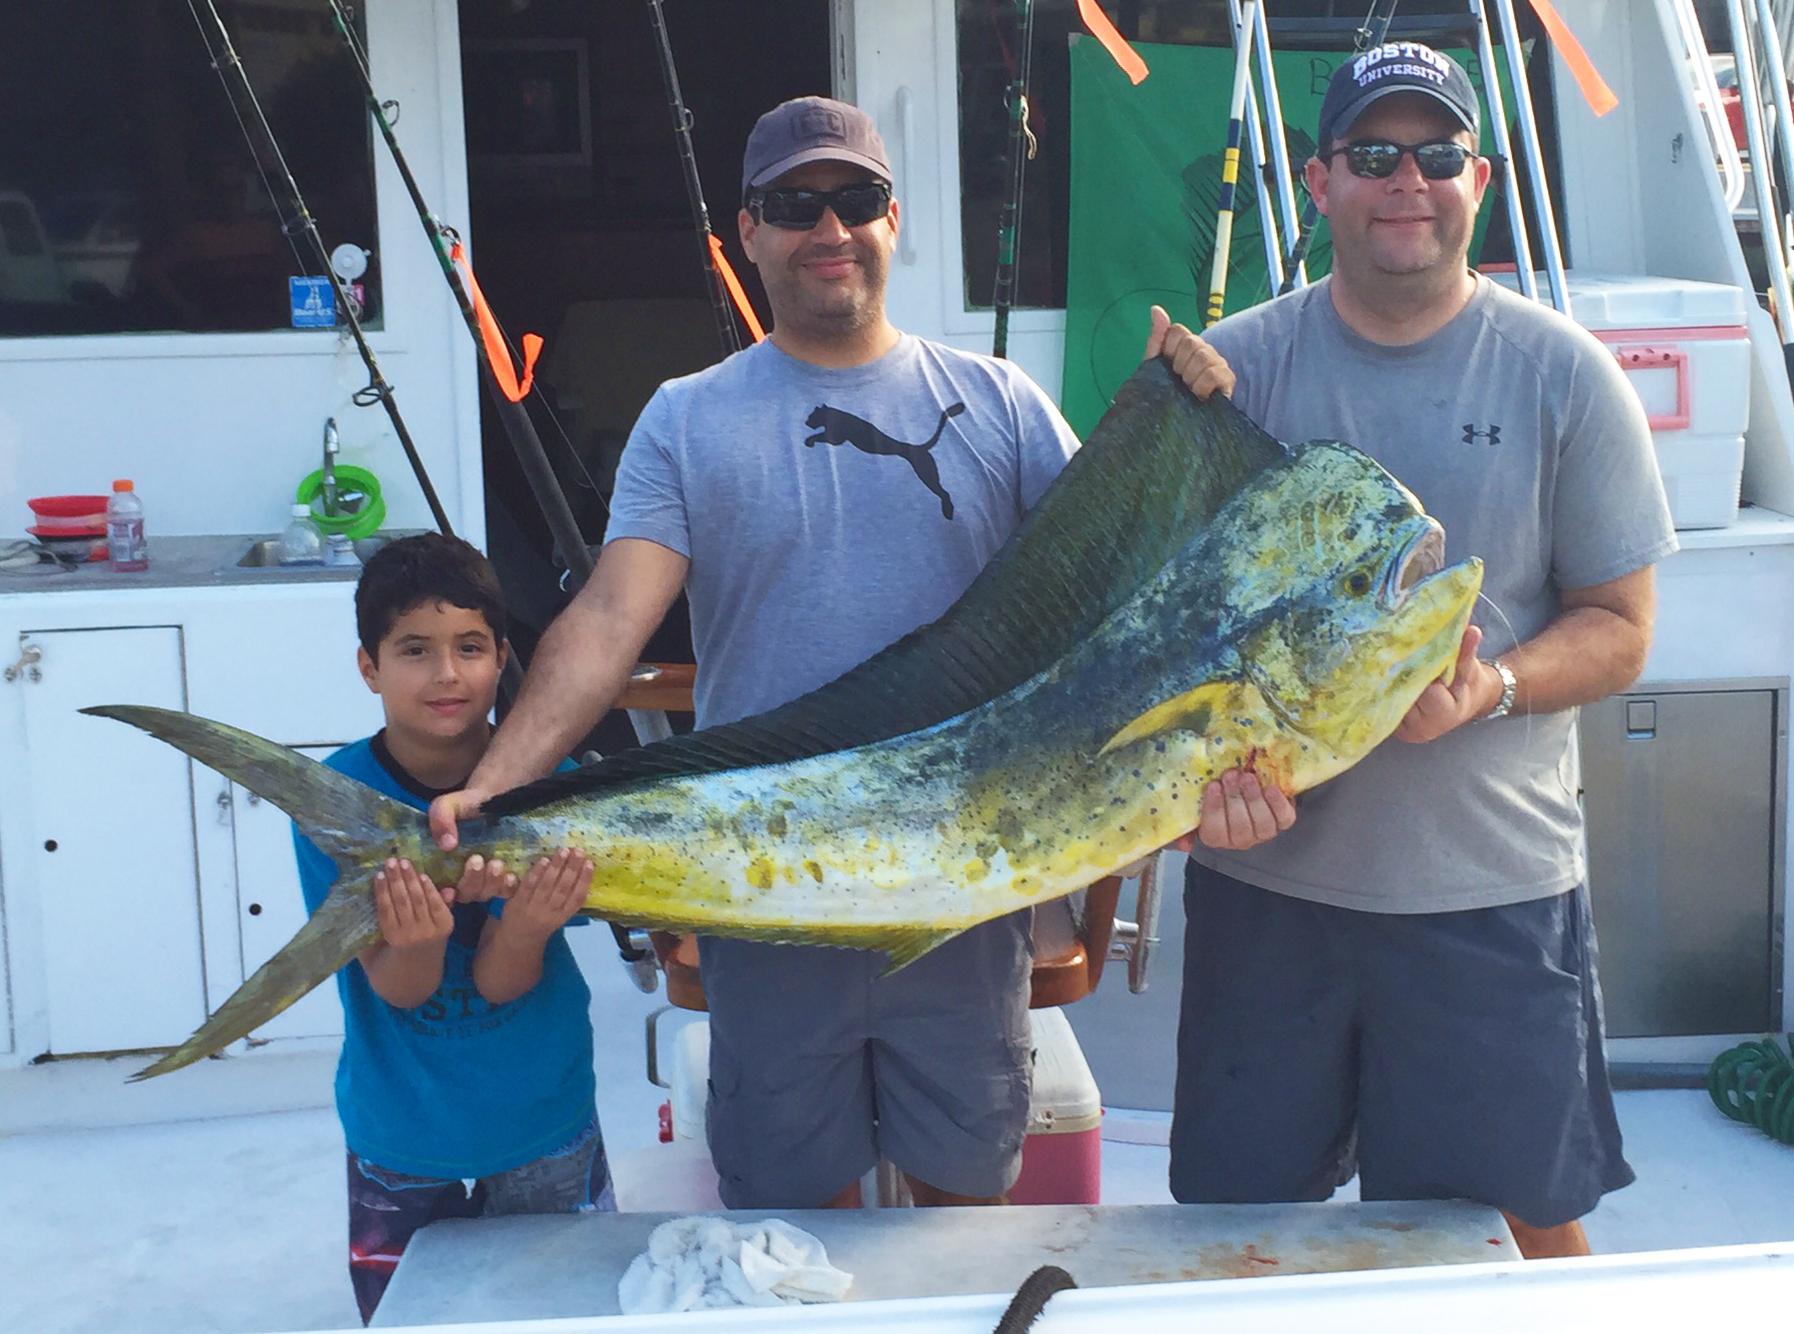 Florida fishing report deep sea fishing in fort lauderdale for Big fishing net